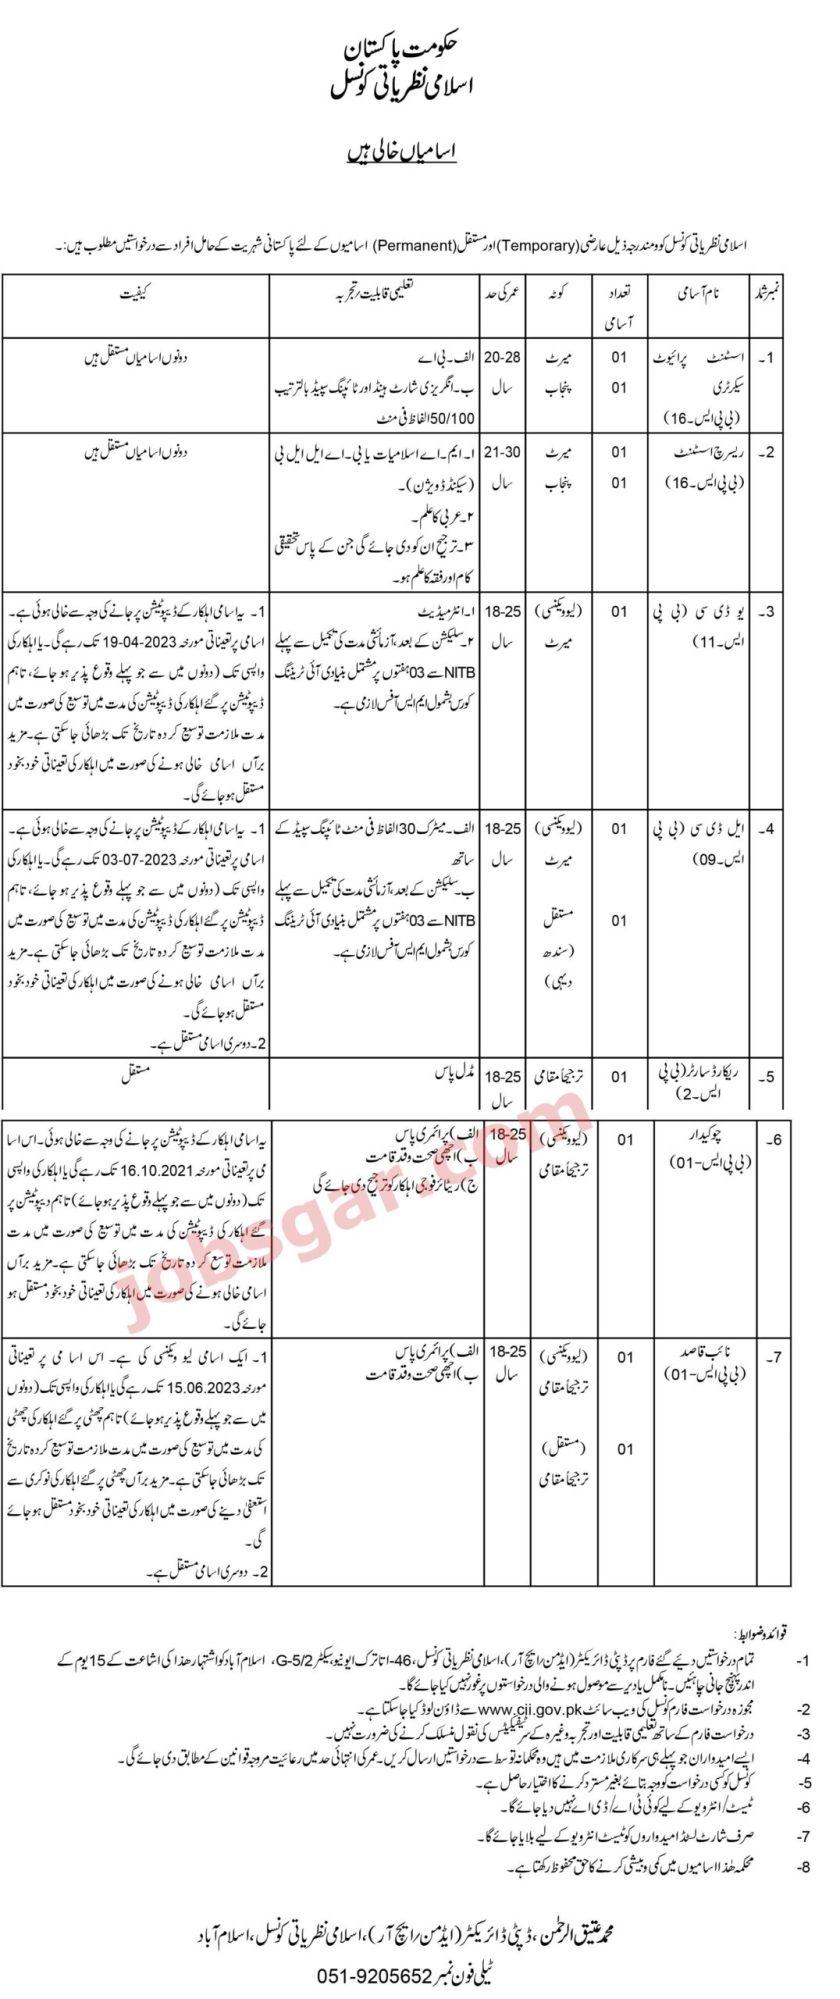 Council of Islamic Ideology Jobs - CII Jobs 2021